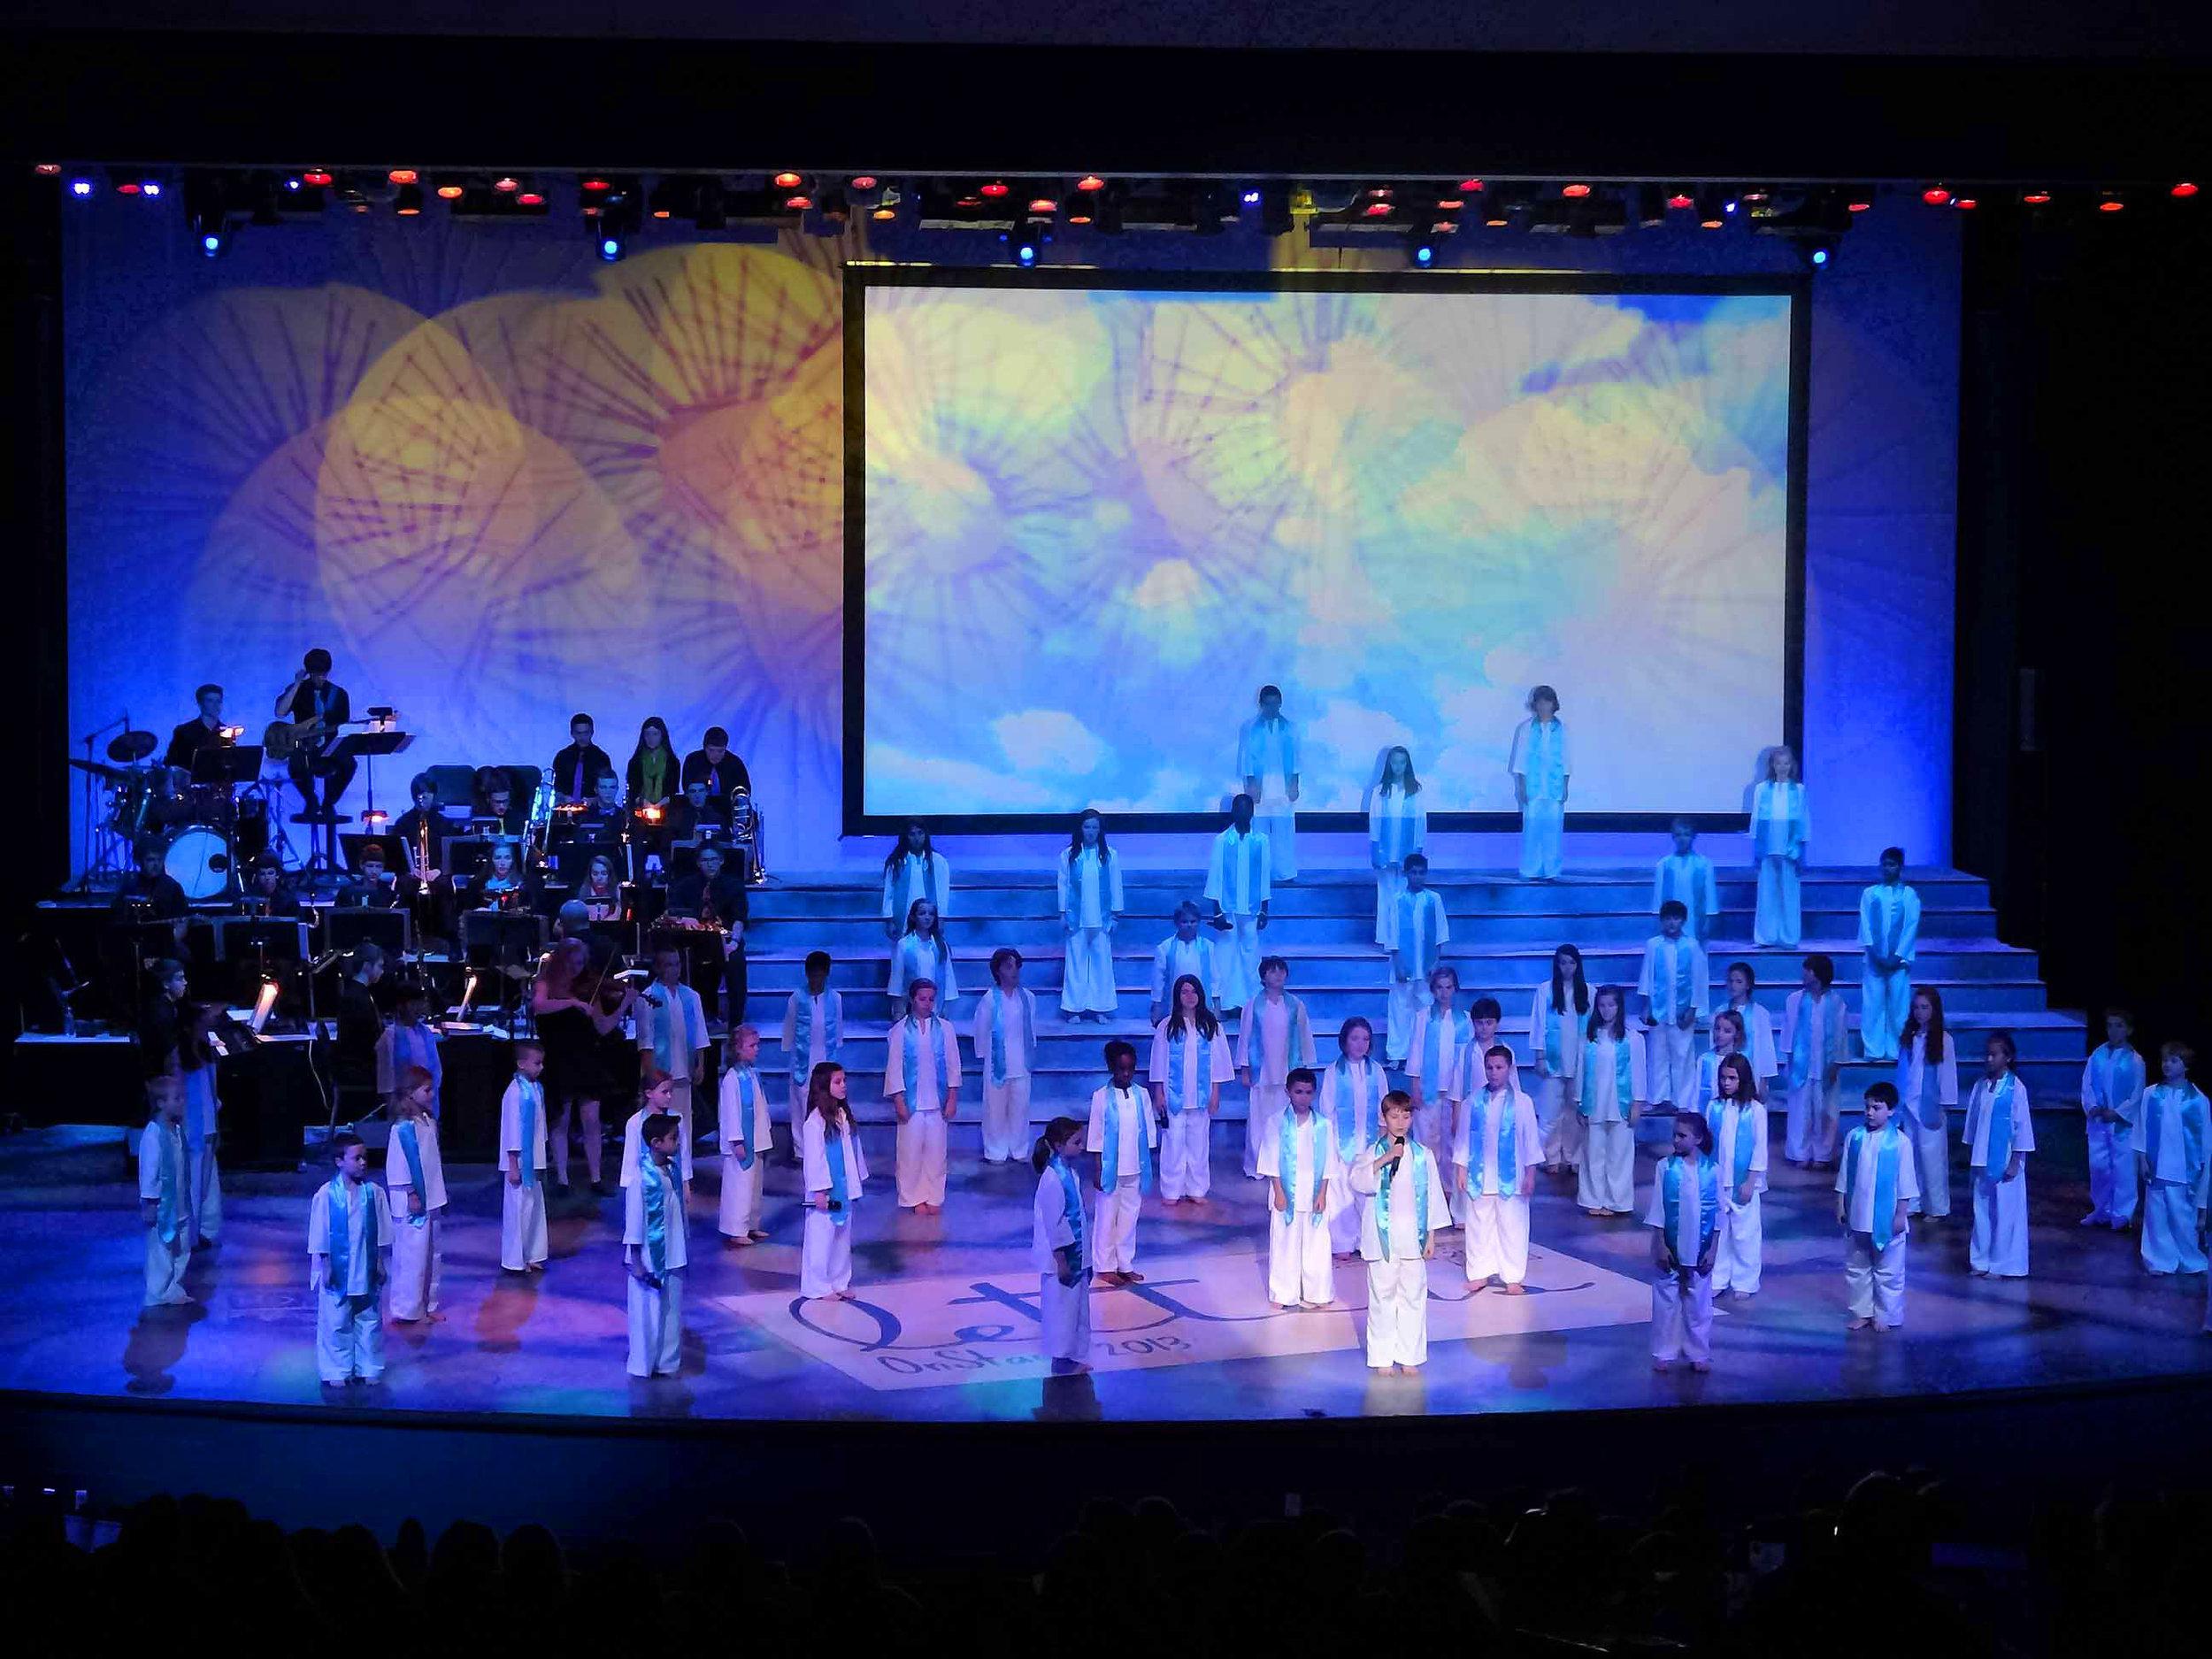 On Stage - Rosemount Performing Arts Center